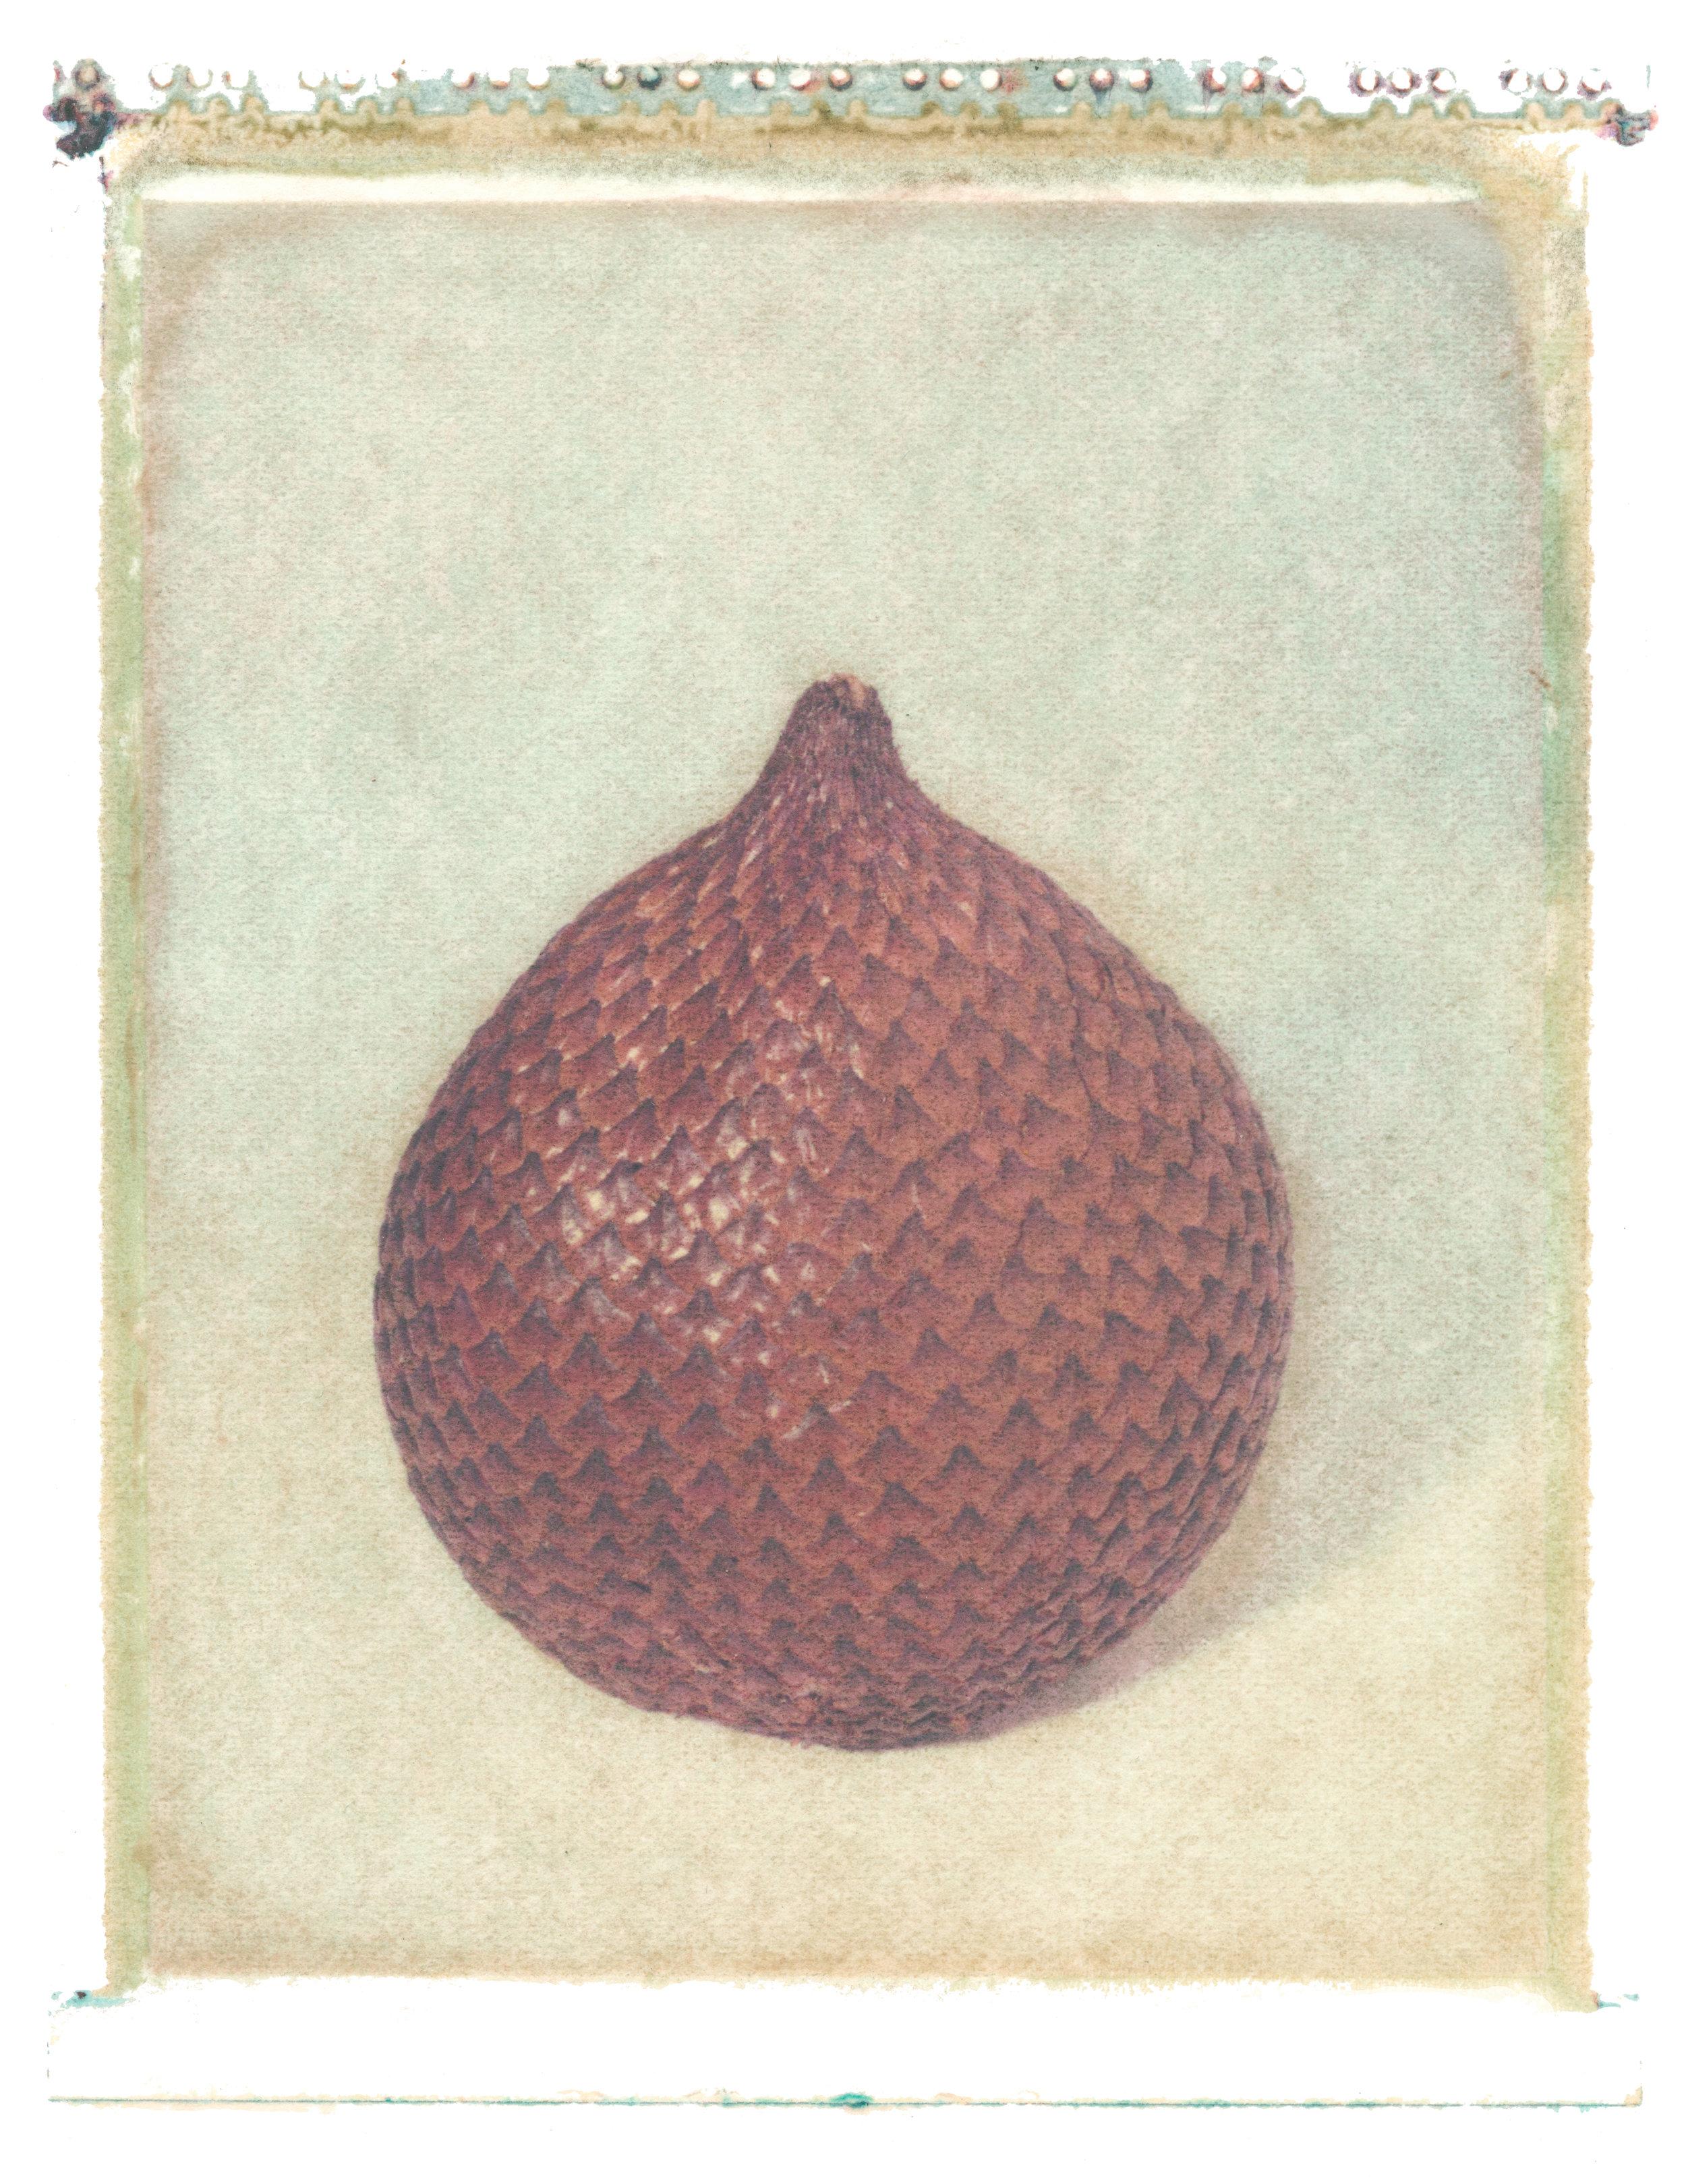 Salacca zalucca , 1997